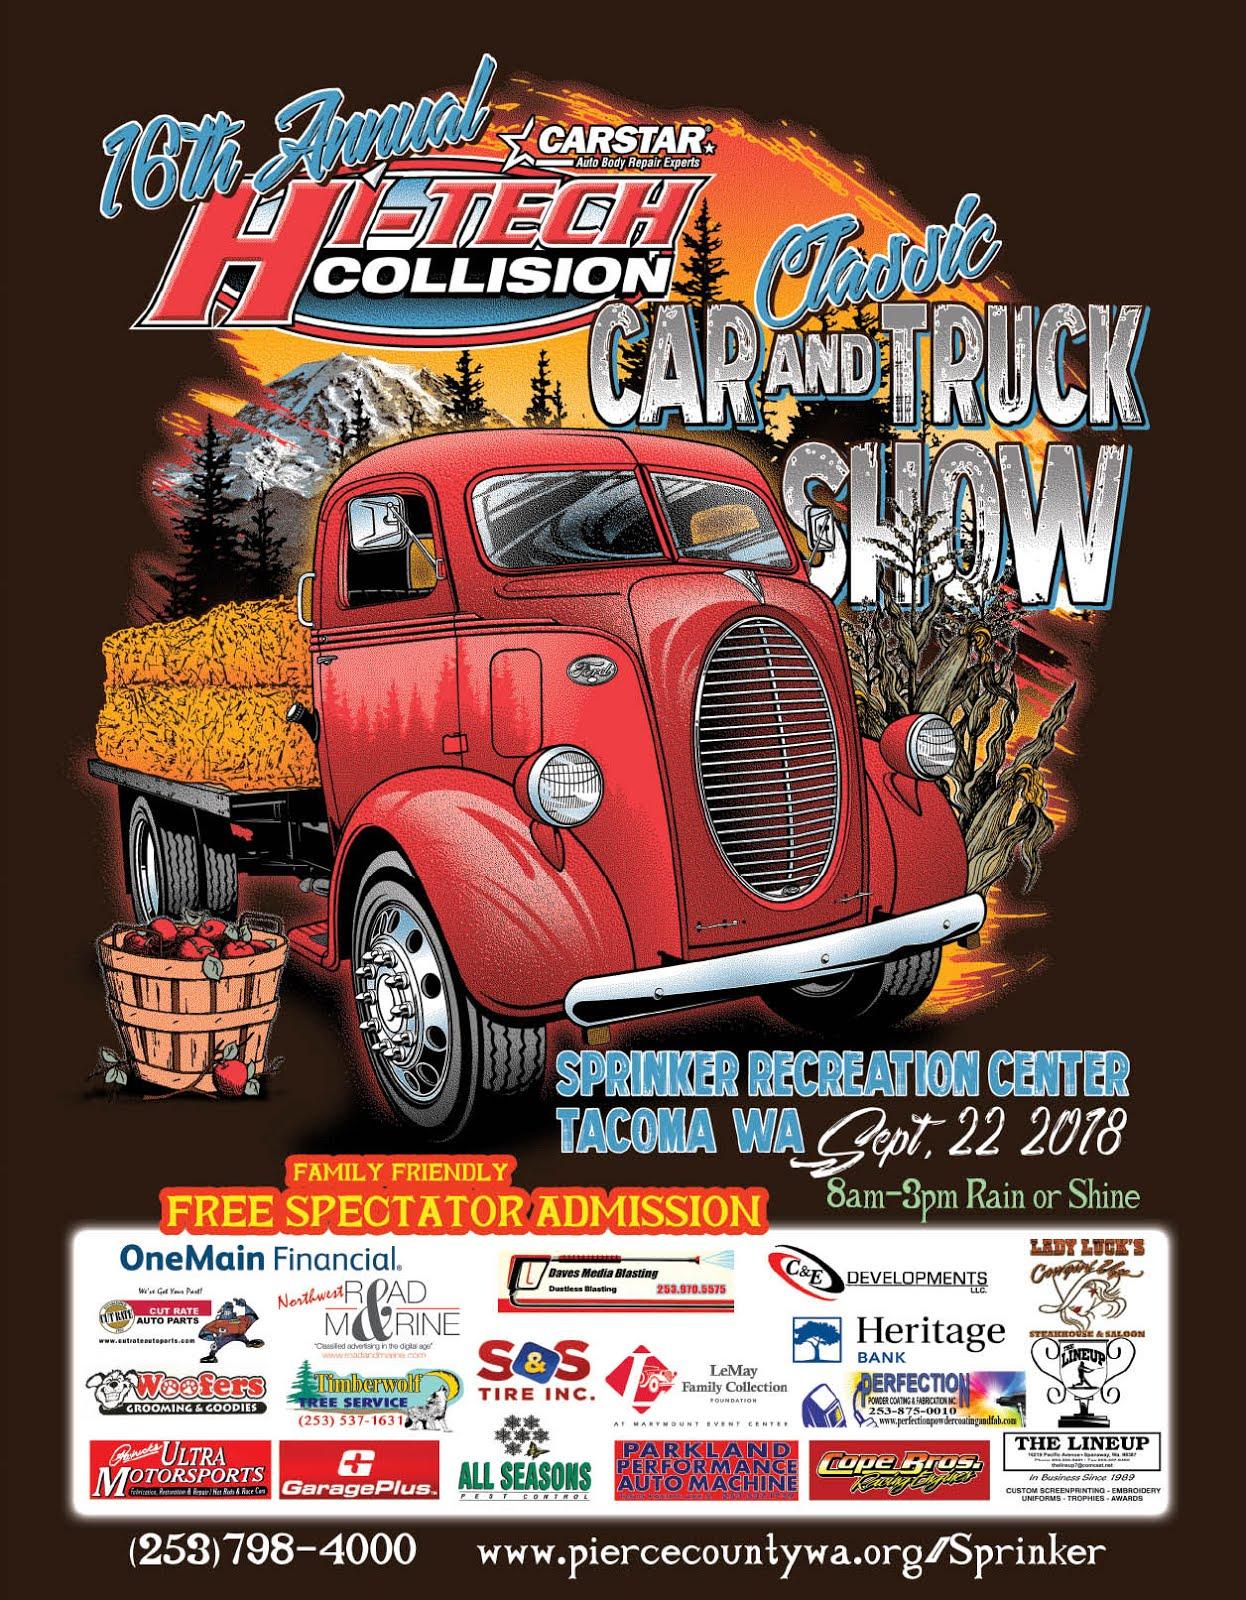 16th Annual Carstar Hi-Tech Collision Classic Car & Truck Show! 500+ Classic Cars and Trucks!!